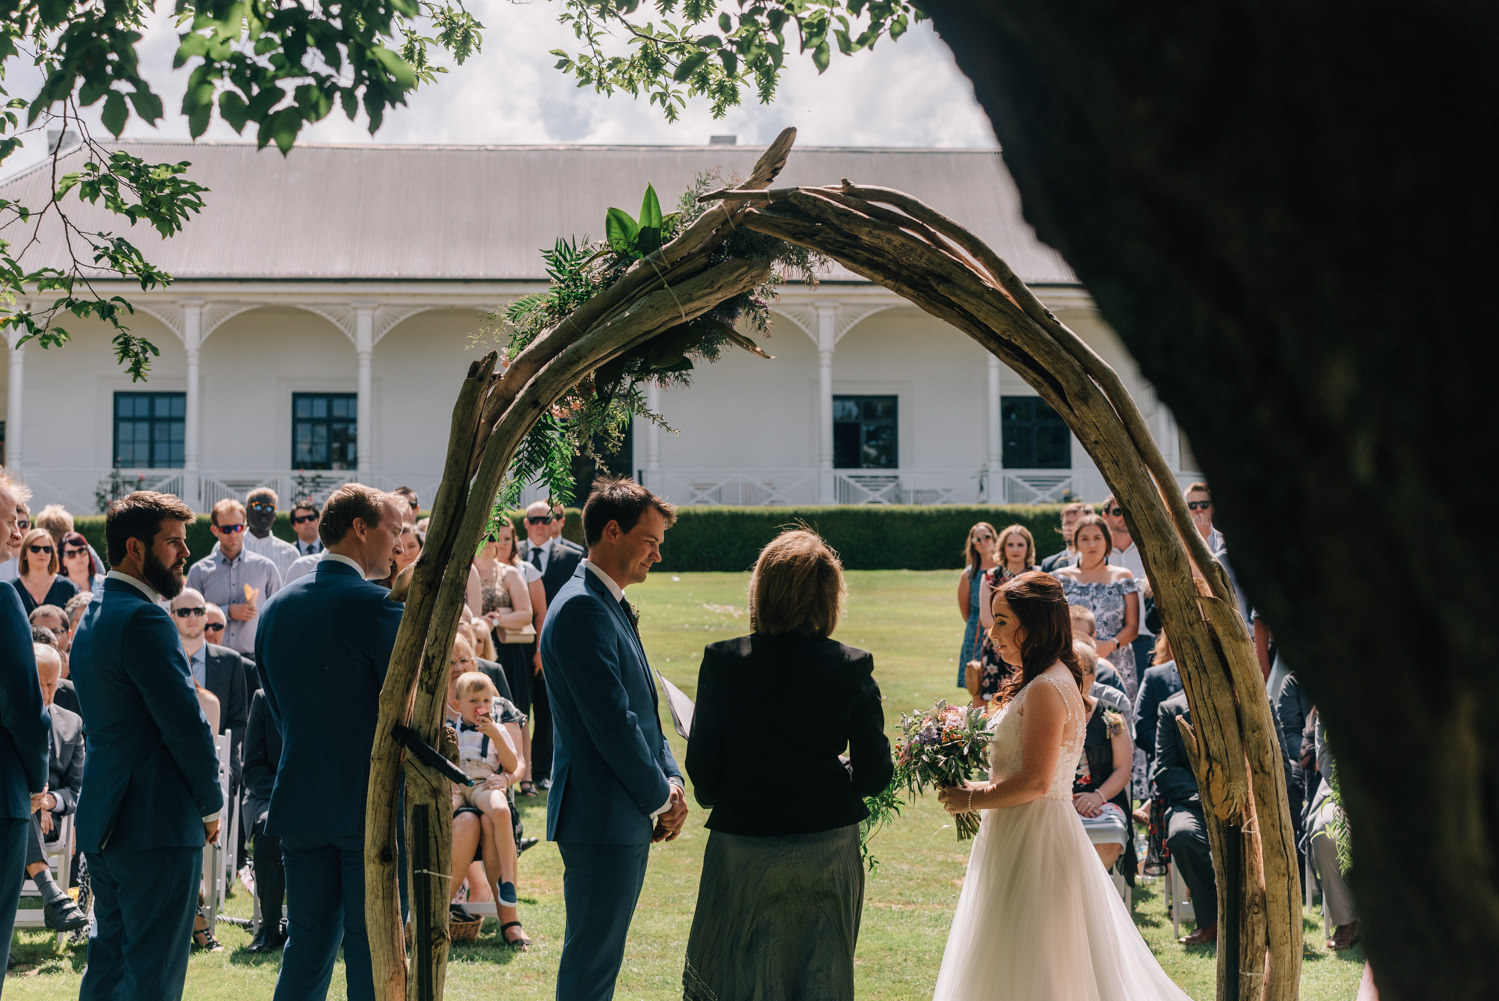 Quamby-Wedding-Photographer-72.jpg